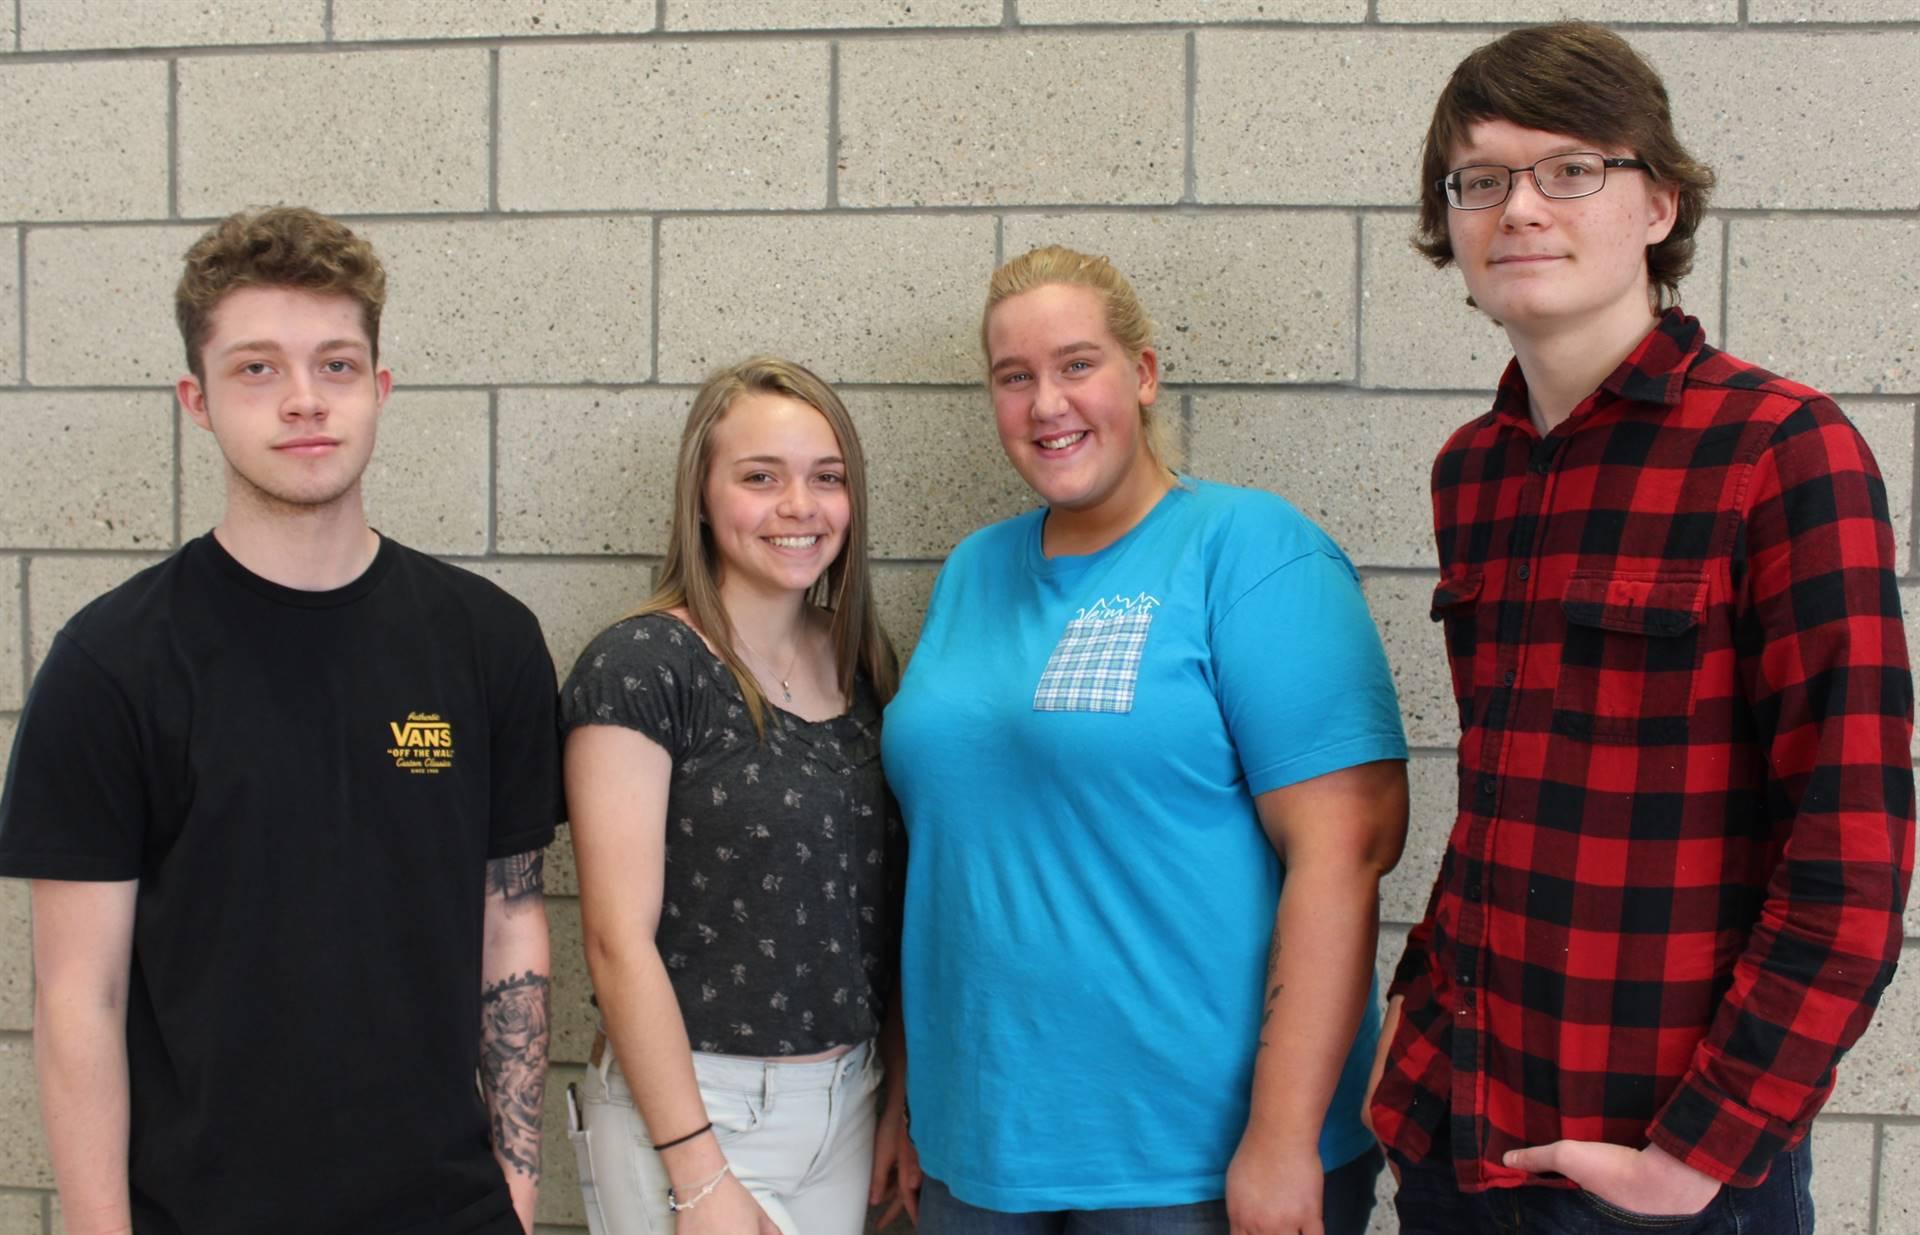 Four of the six Extra Effort Third Quarter Award Recipients